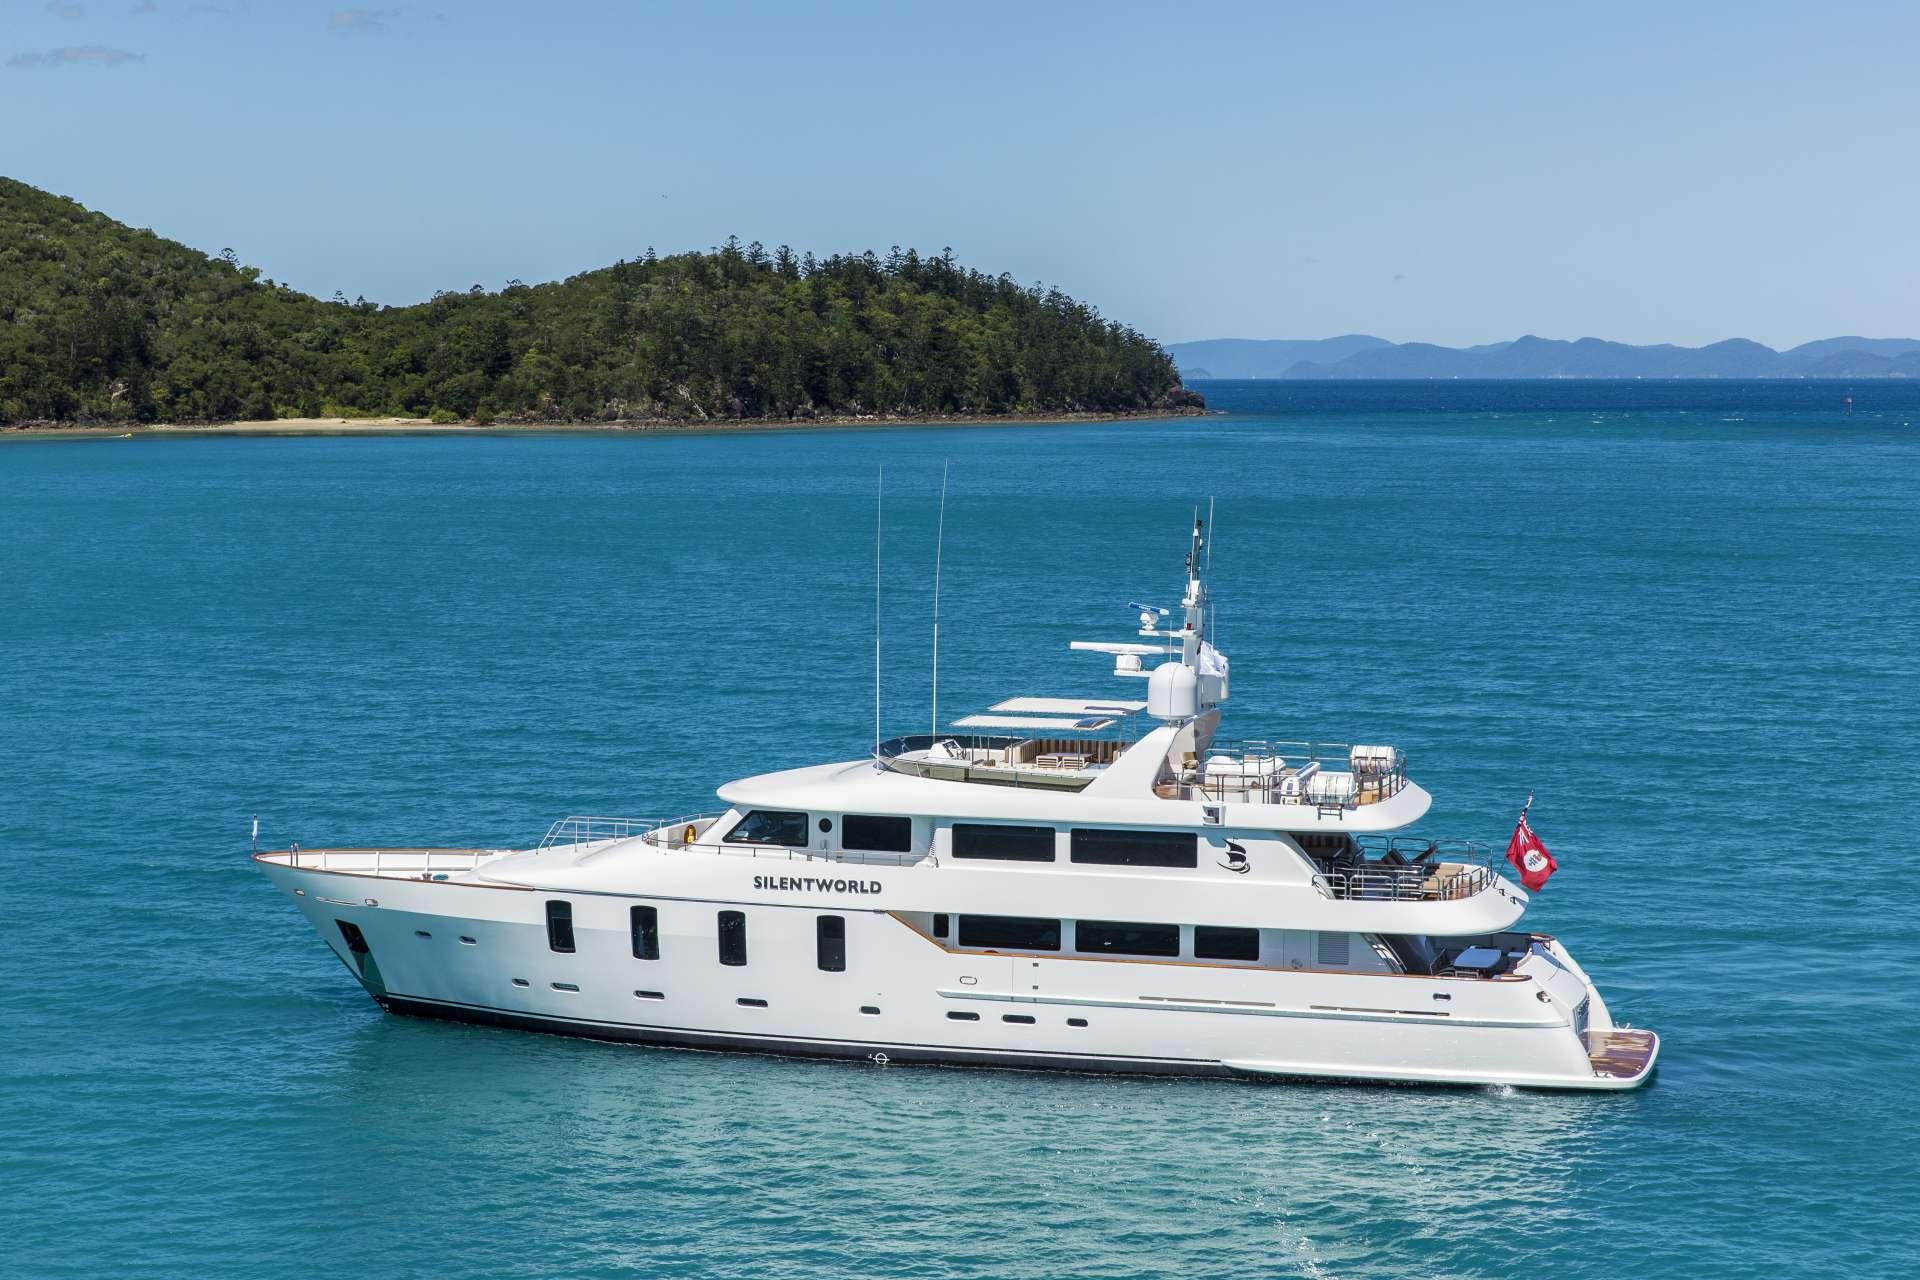 Power Yacht 'Power', 12 PAX, 8 Crew, 131.00 Ft, 40.00 Meters, Built 2006, Astilleros Wzuriaga, Refit Year 2015